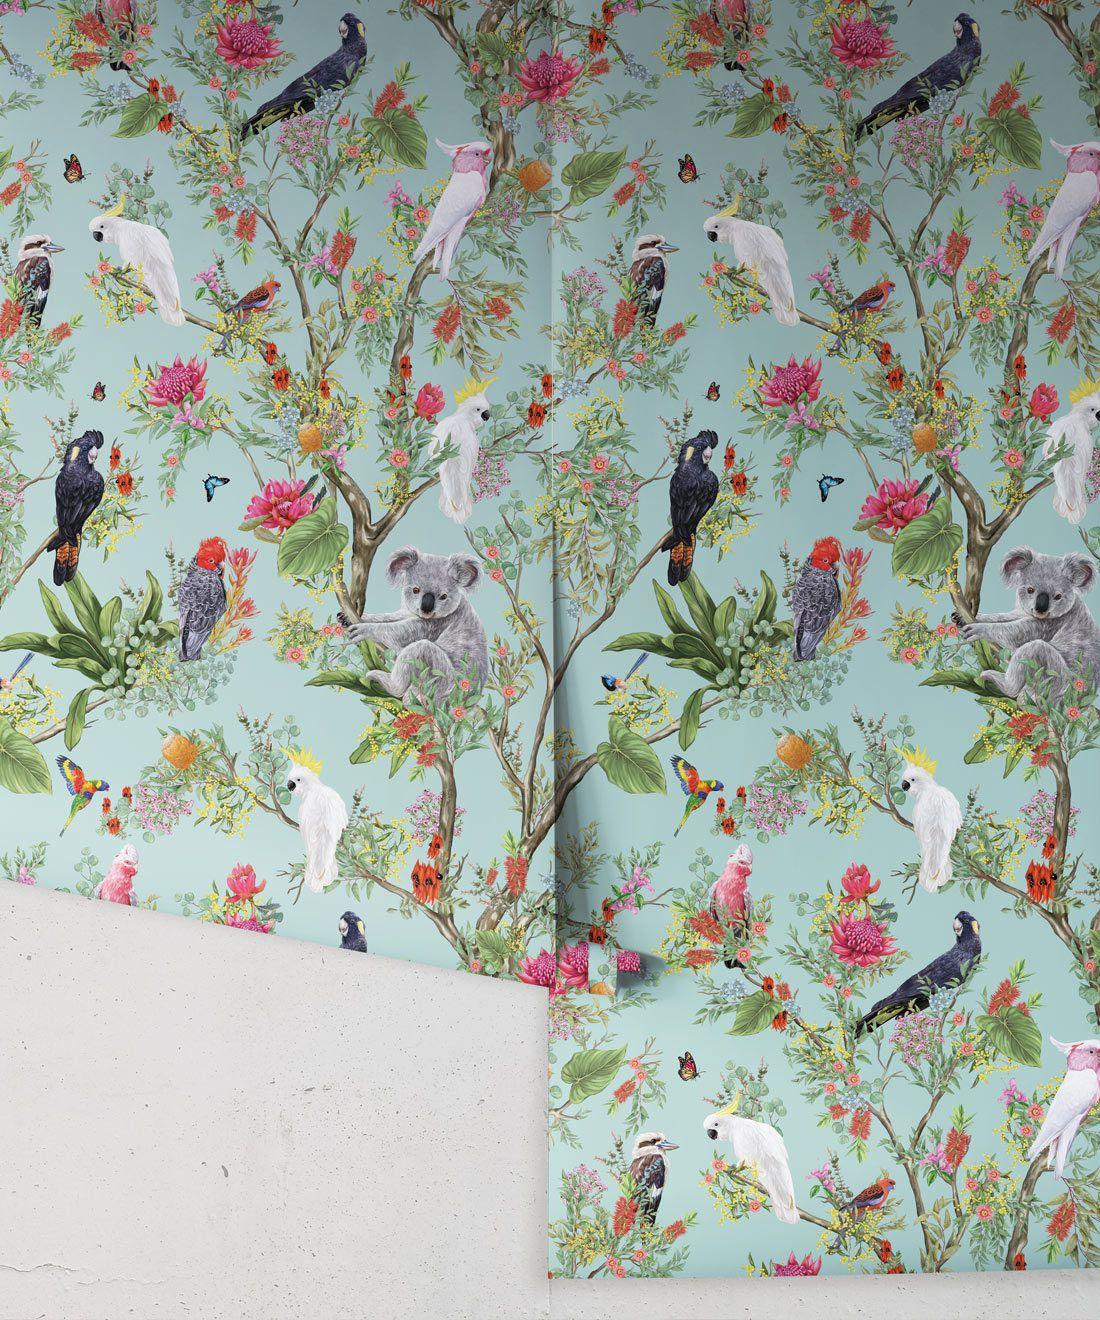 Australia Wallpaper • Cockatoos, Koalas, Parrots, Finches • Milton & King USA • Mint Green Wallpaper Roll